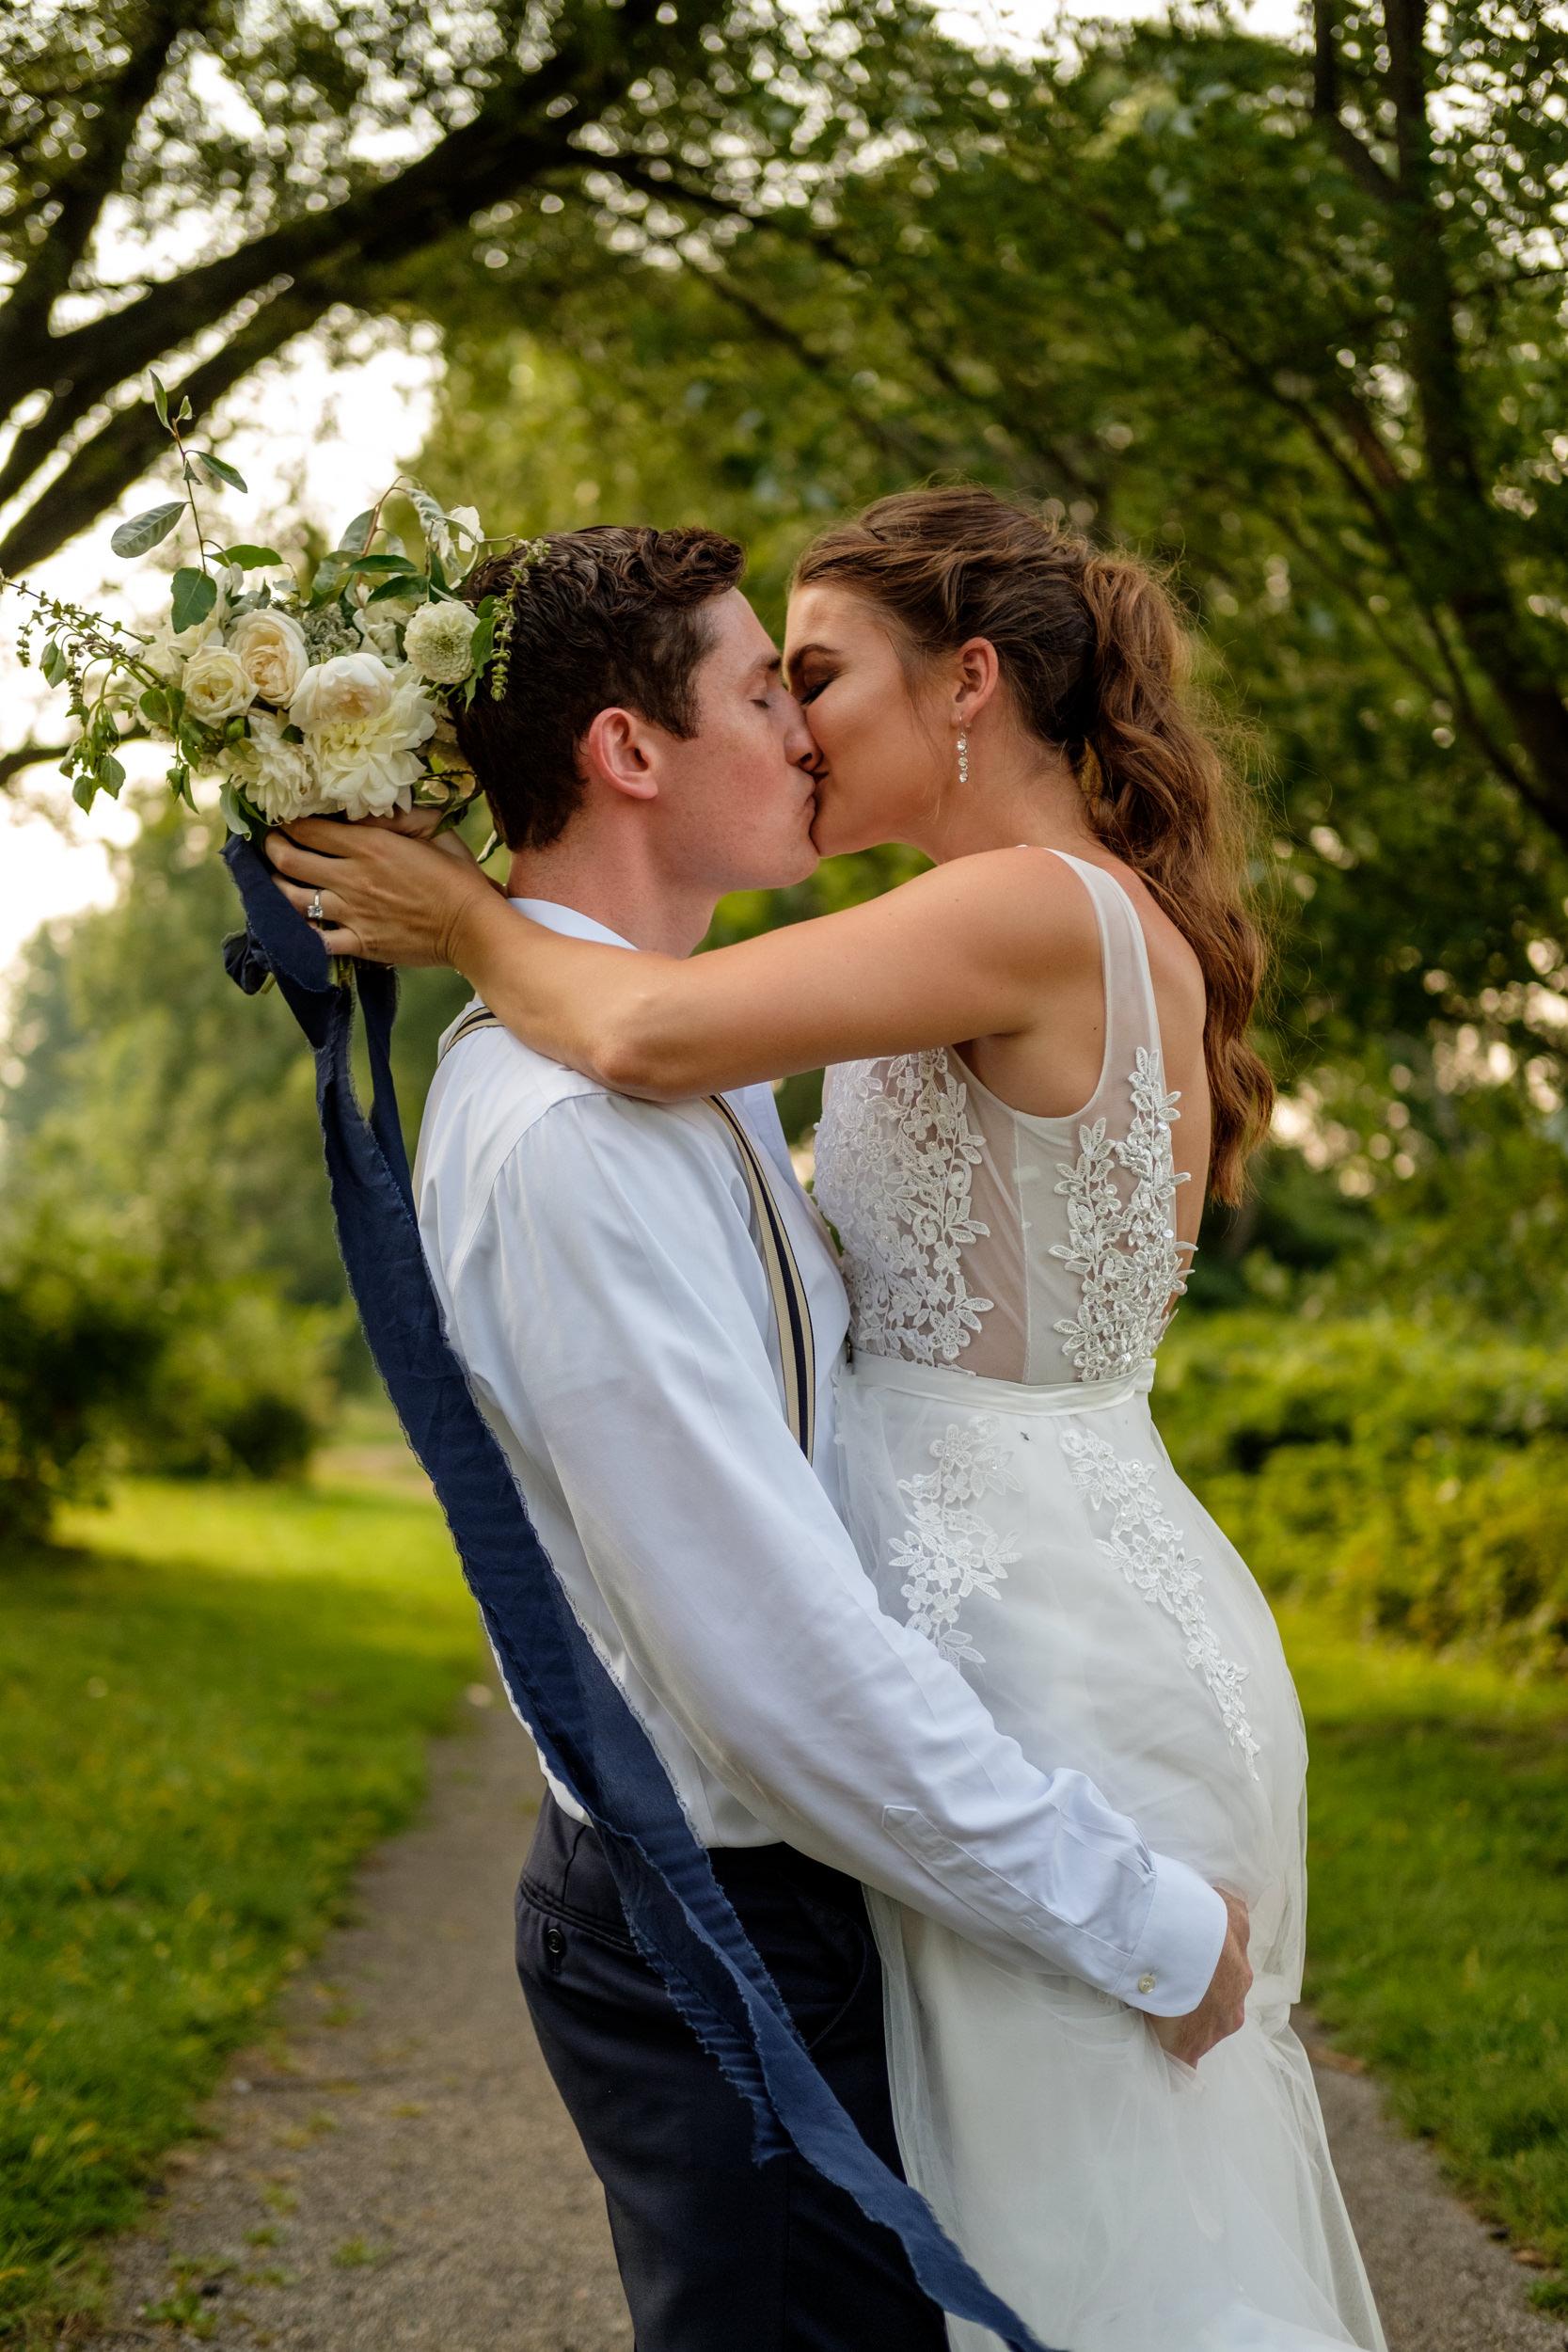 TheSmythCollective-Best-Cincinnati-Wedding-Photographer-002.jpg